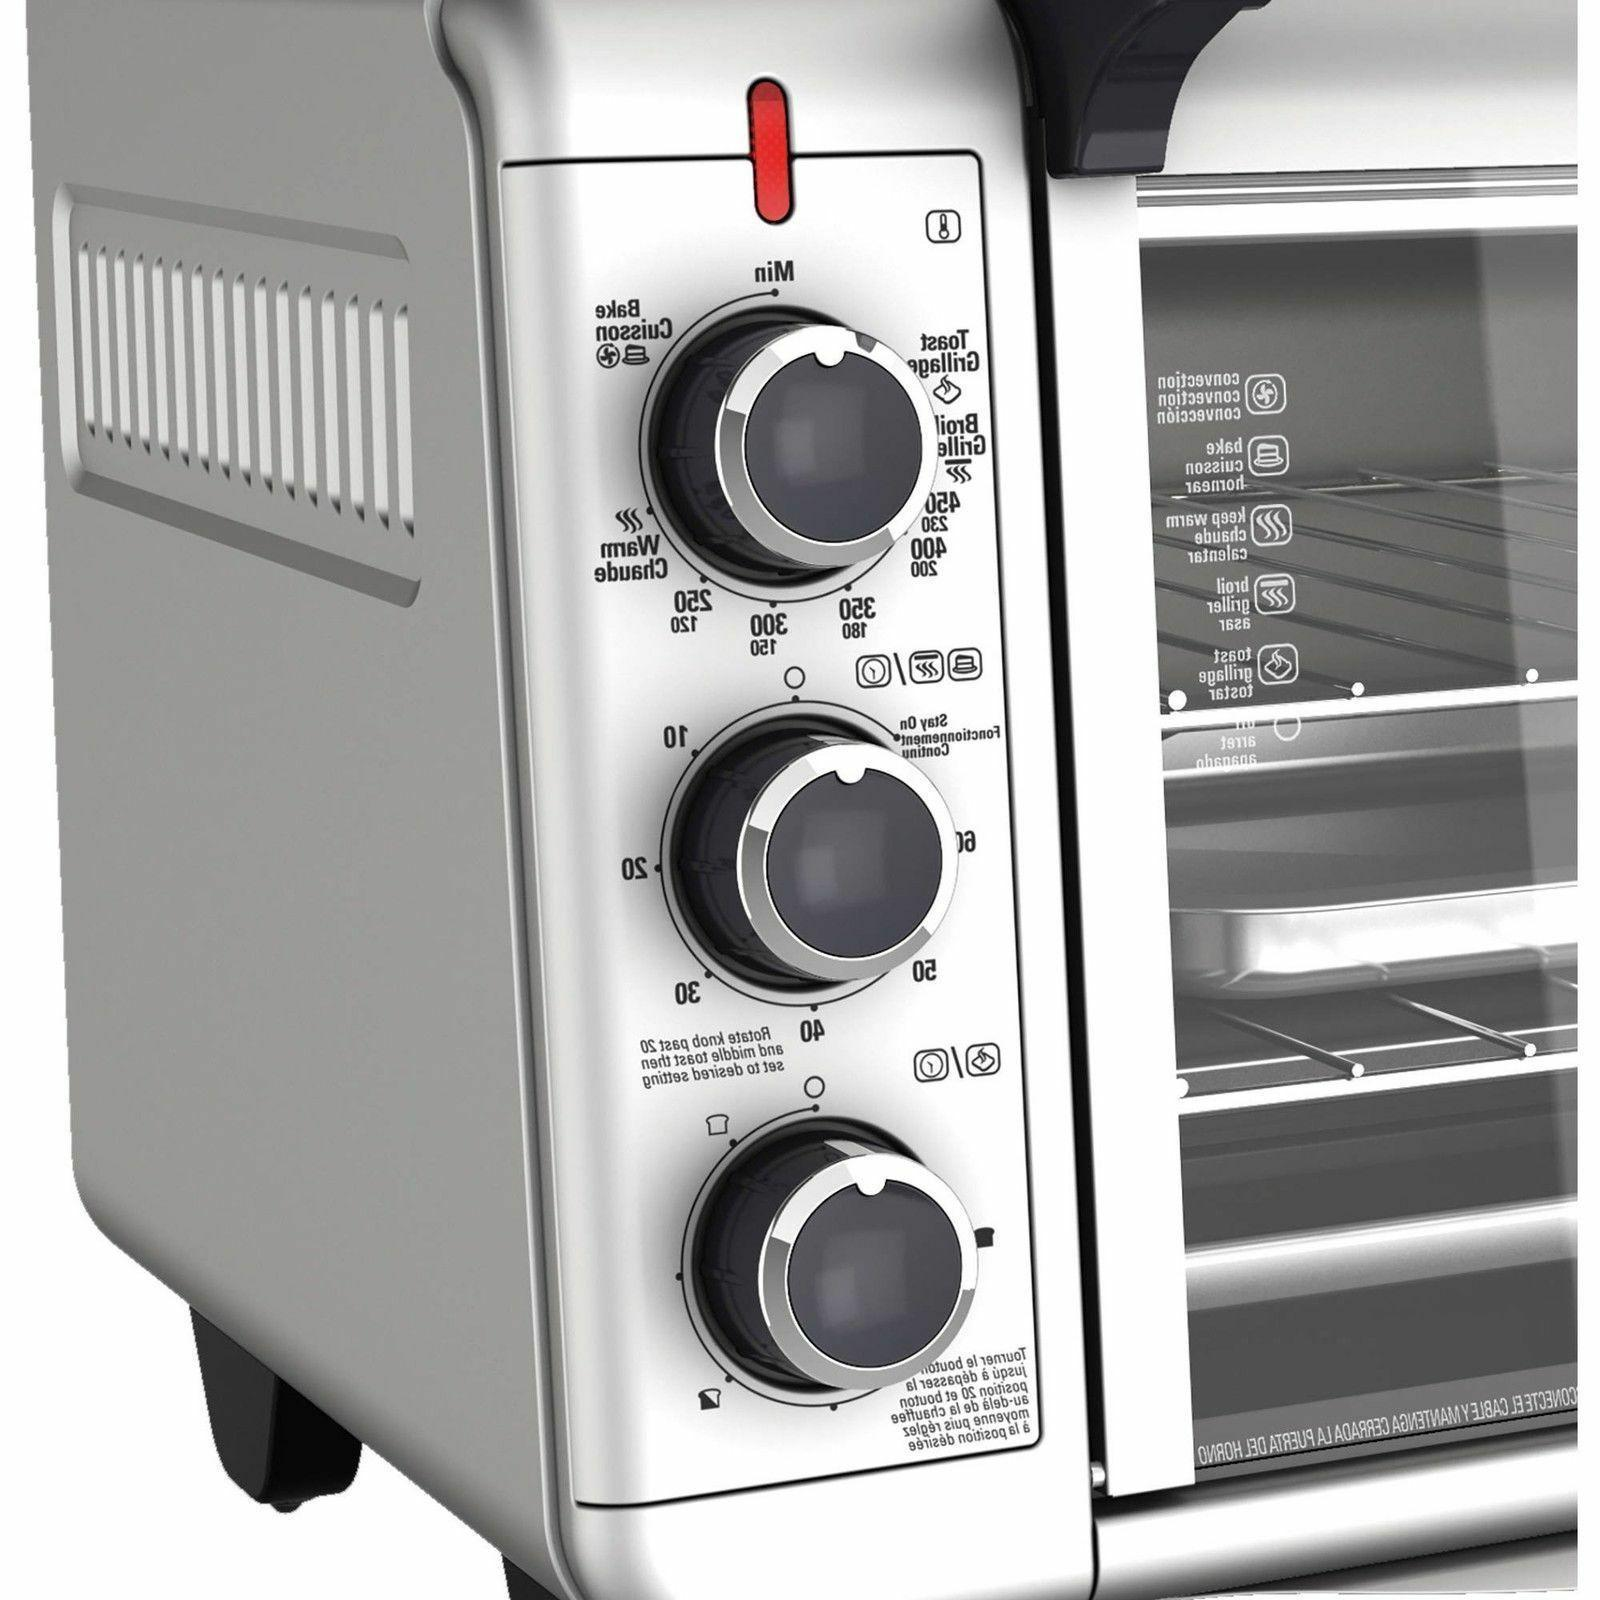 6-Slice Oven TO3000G BRAND